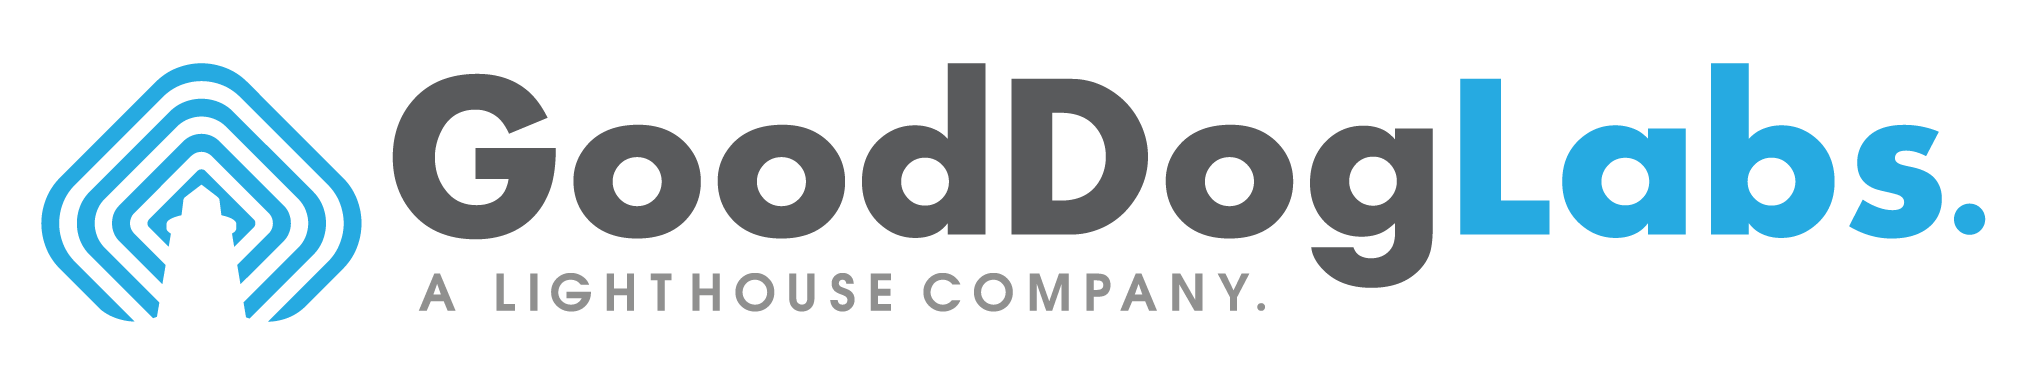 GoodDogLabs Logo